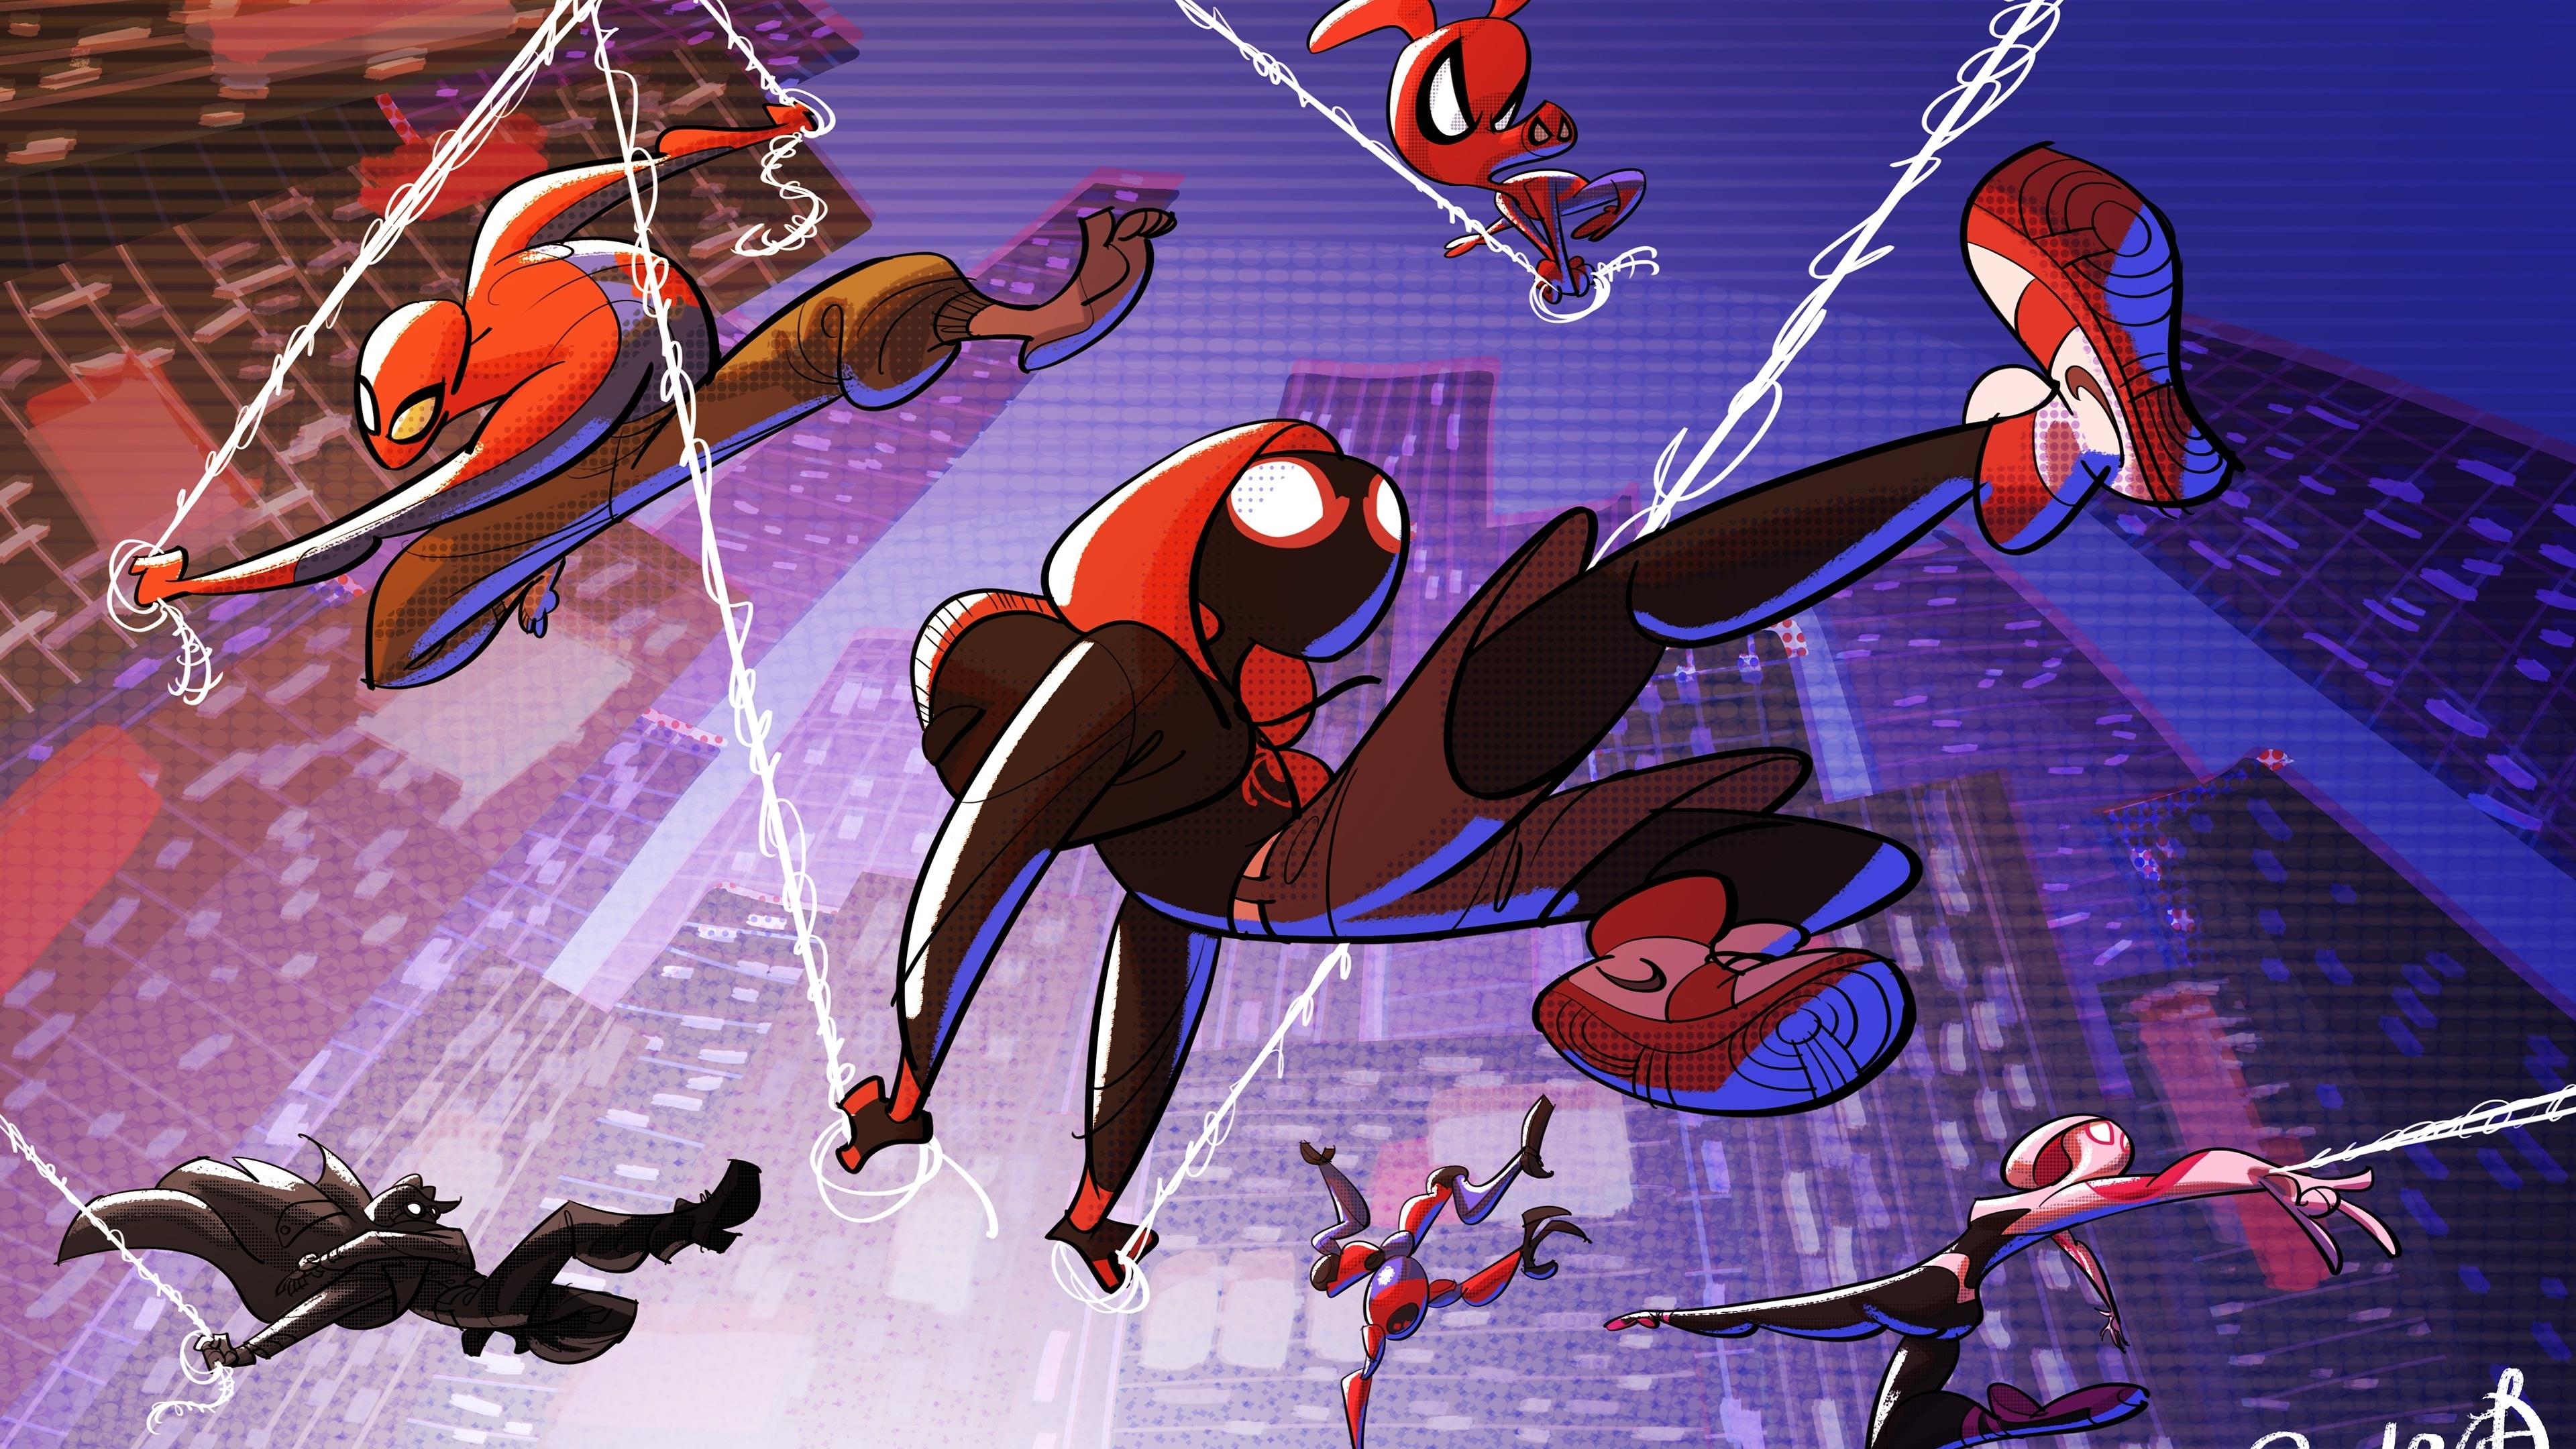 Download 3840x2160 Wallpaper All Superheroes Movie Artwork